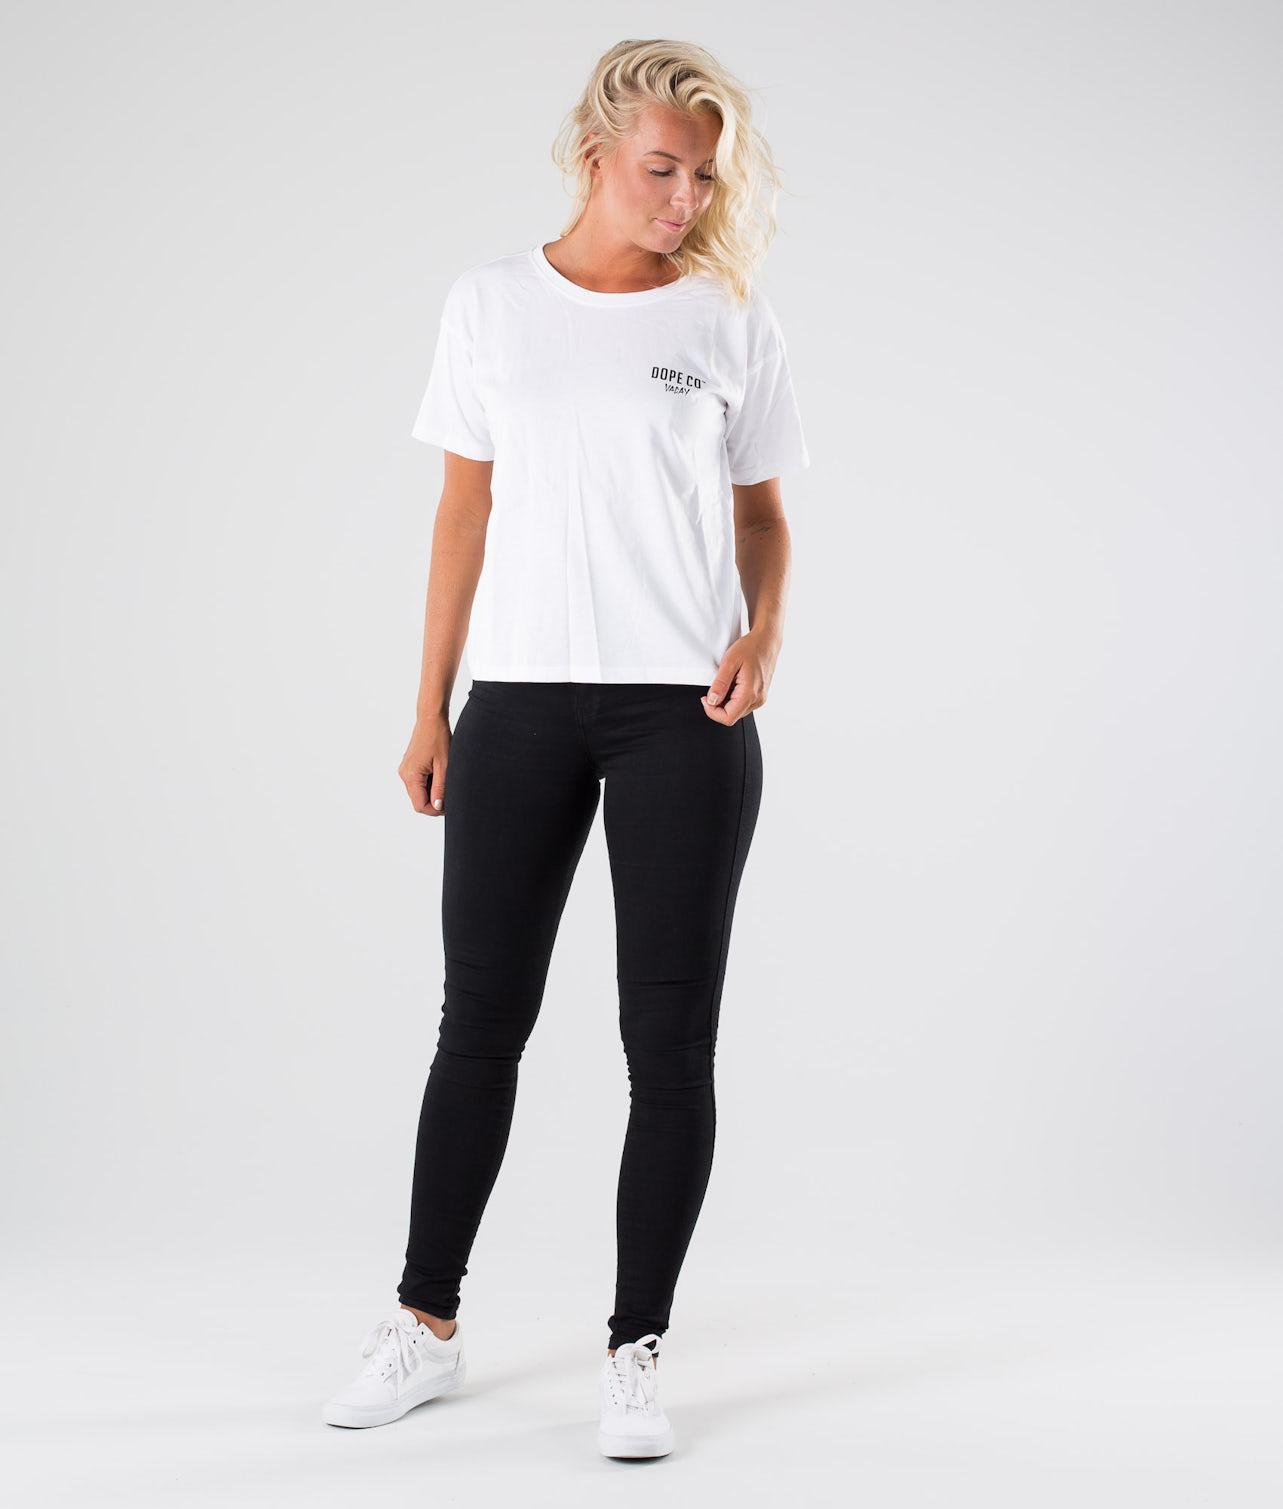 Dope Grand Flamingo T-shirt White